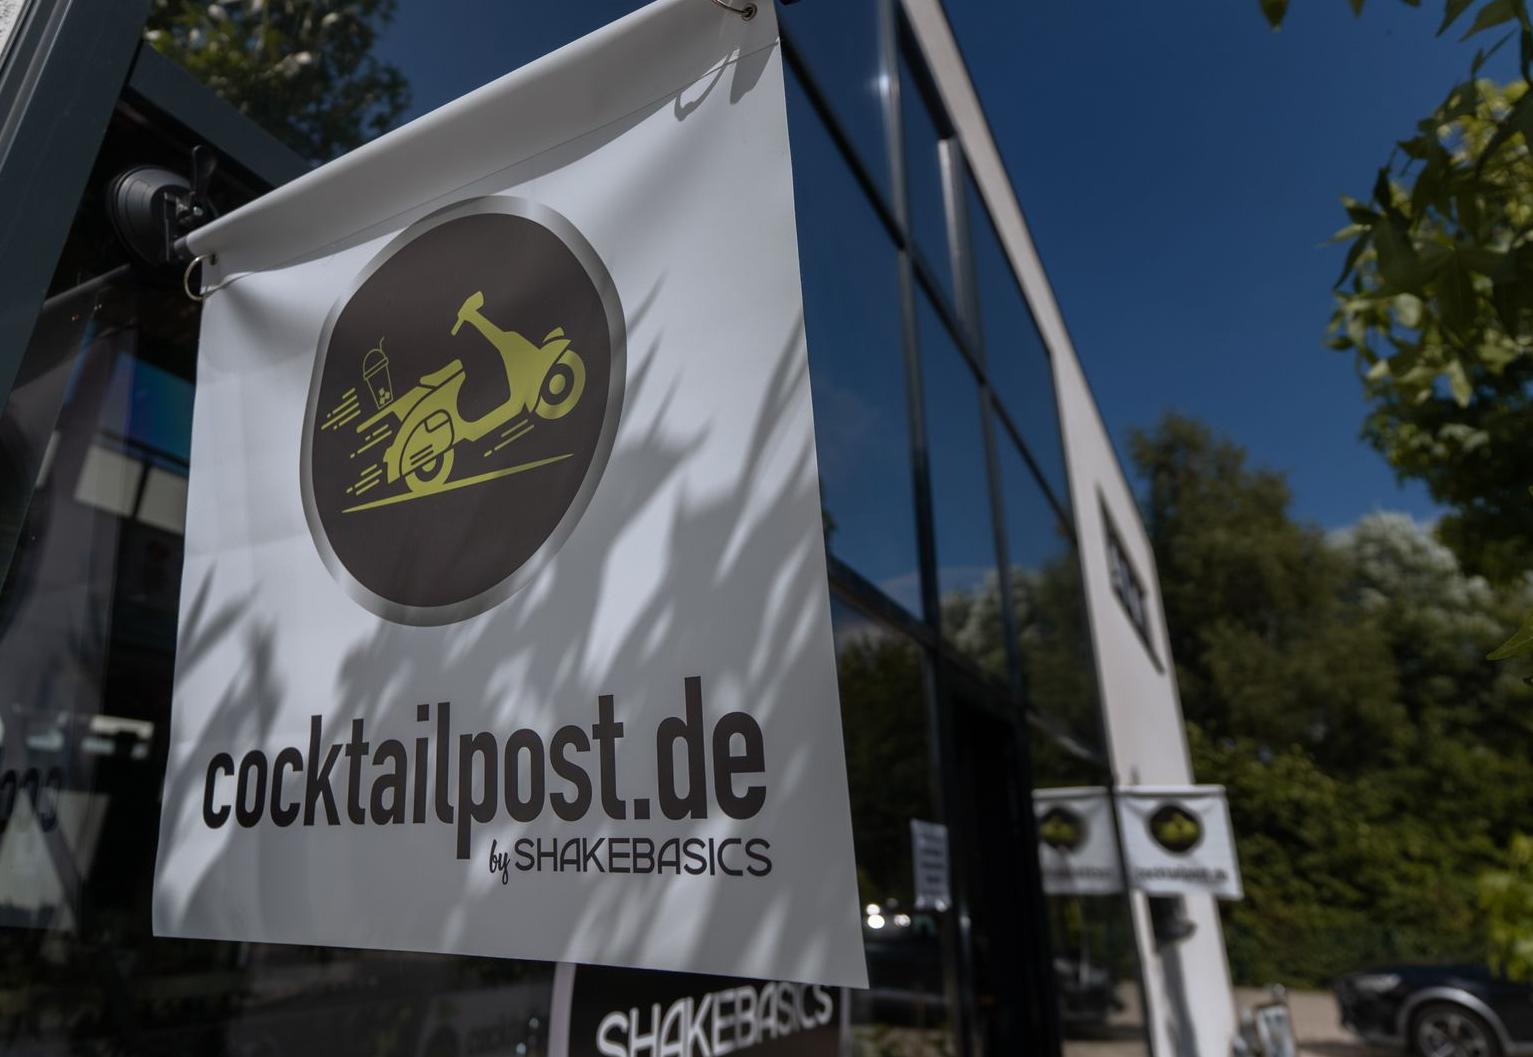 cocktailpost.de